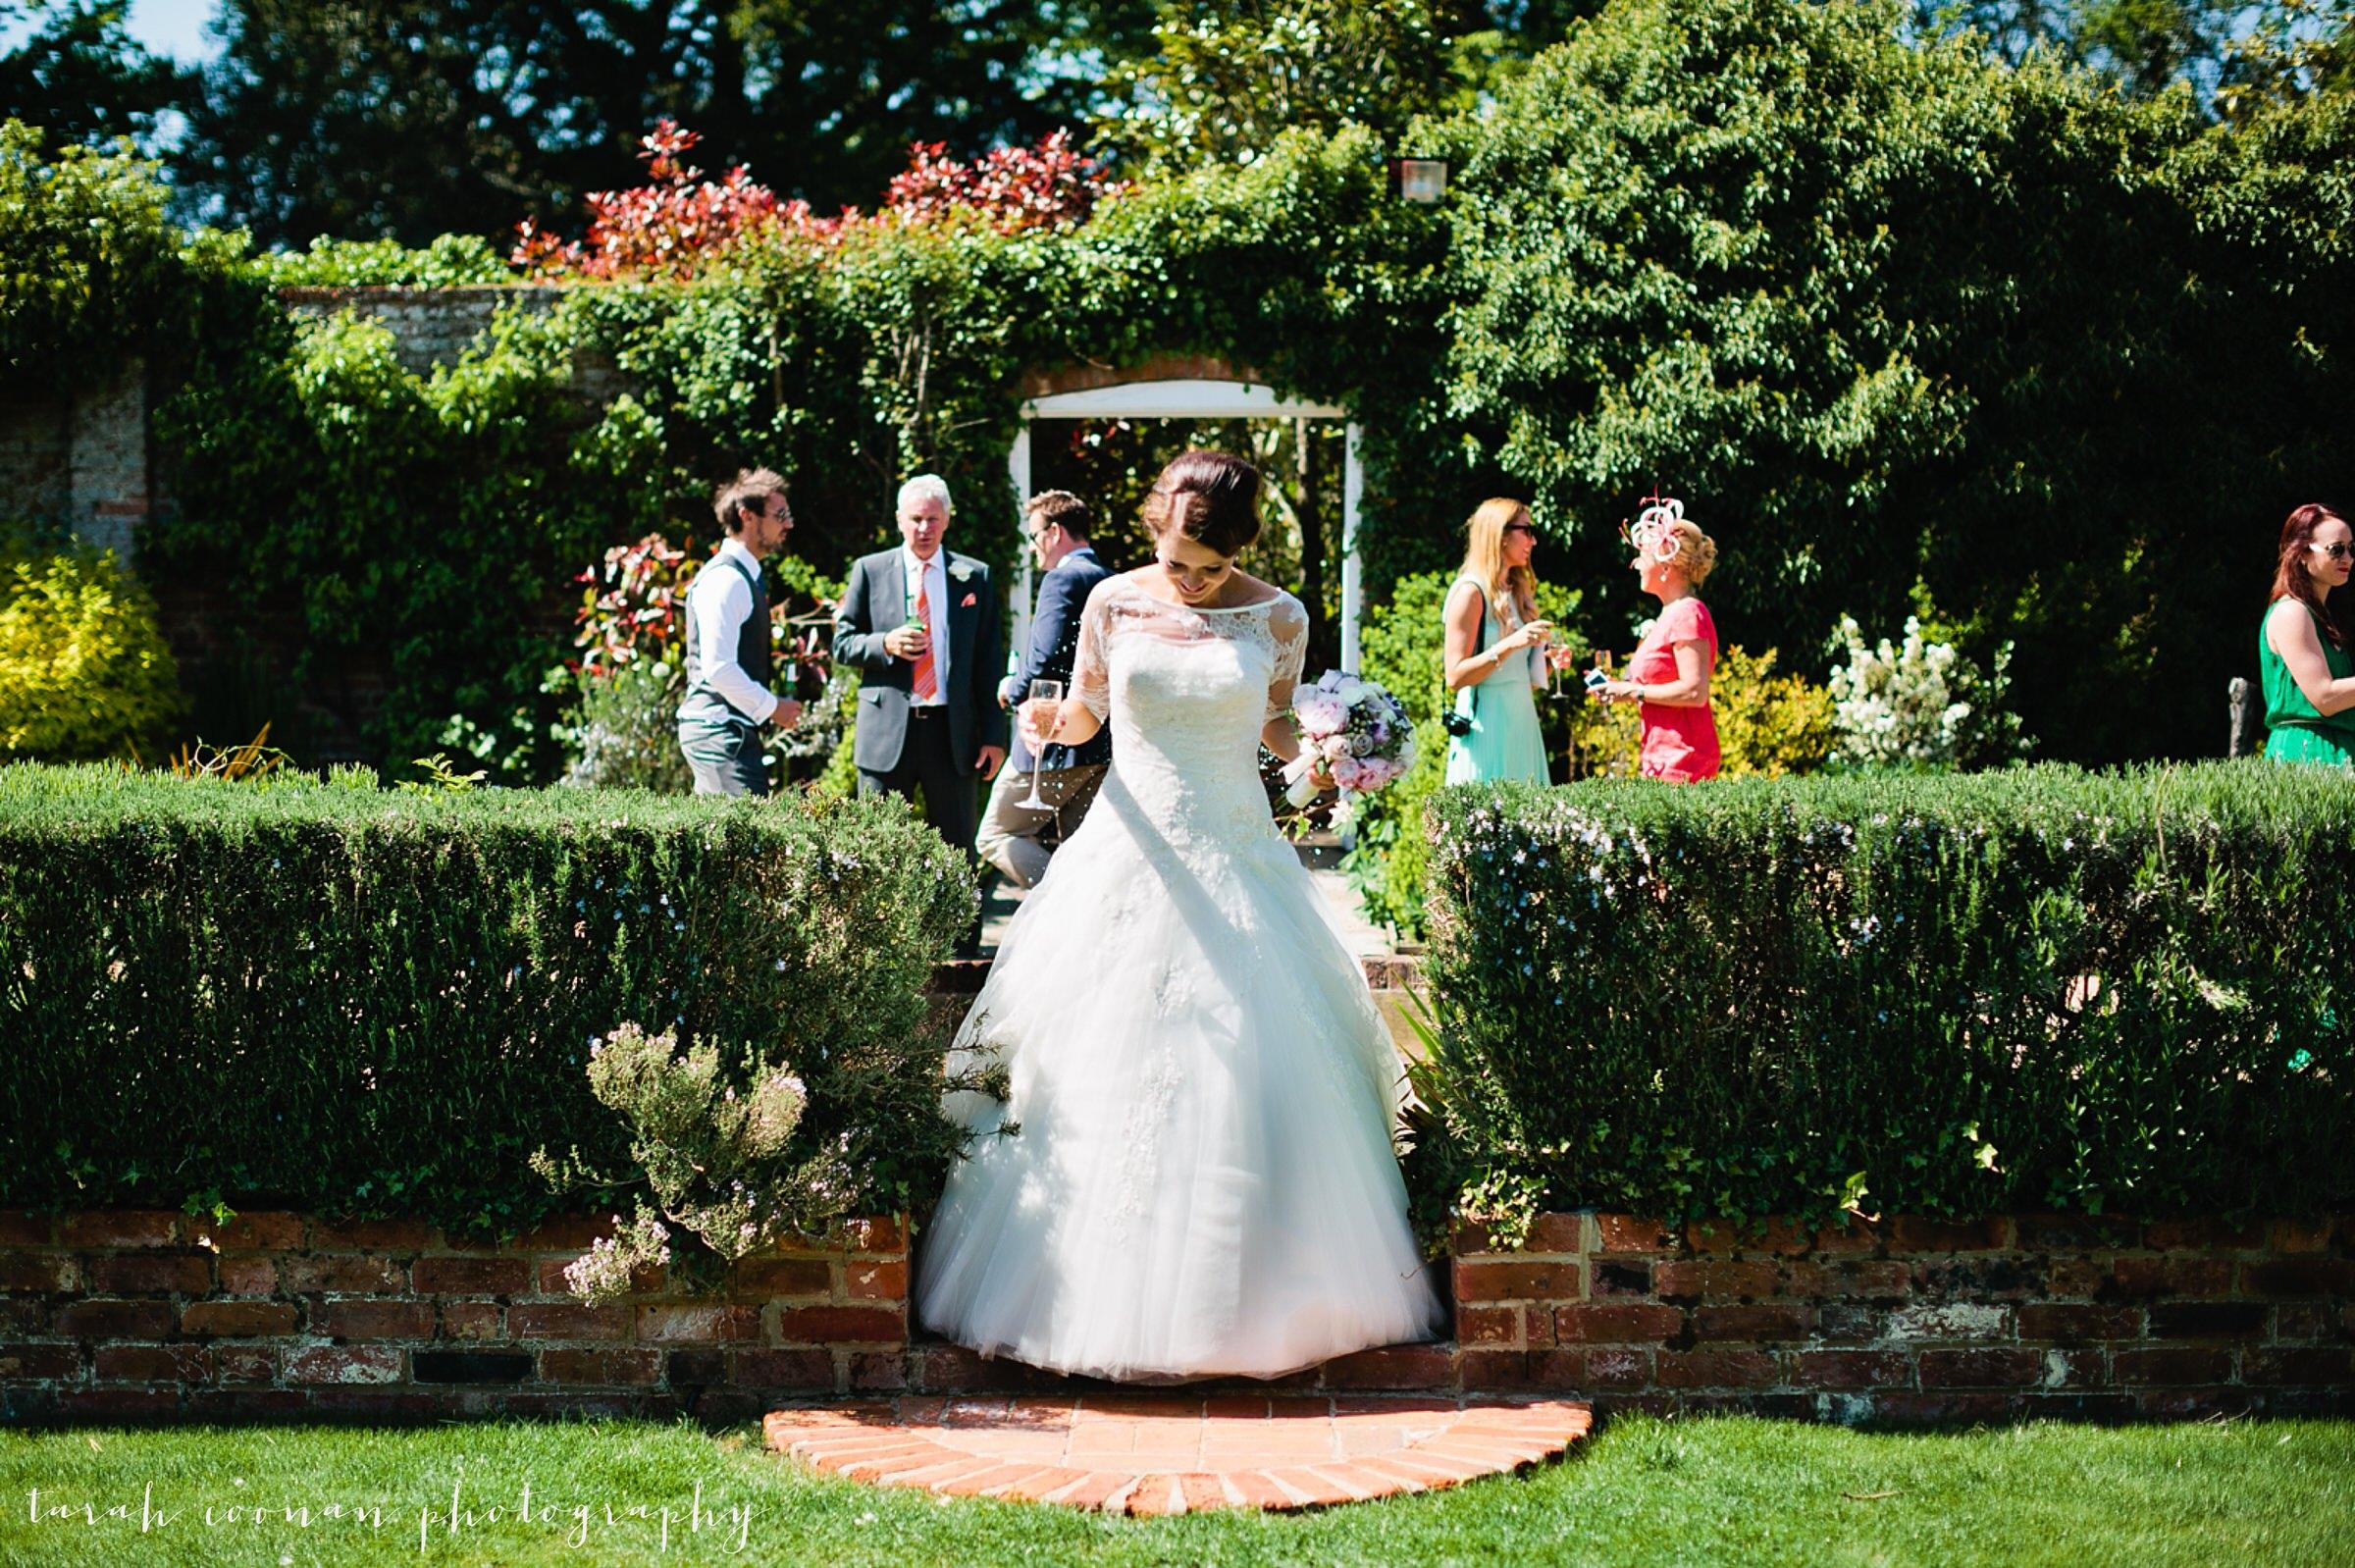 northbrook-park-wedding-photographer_055